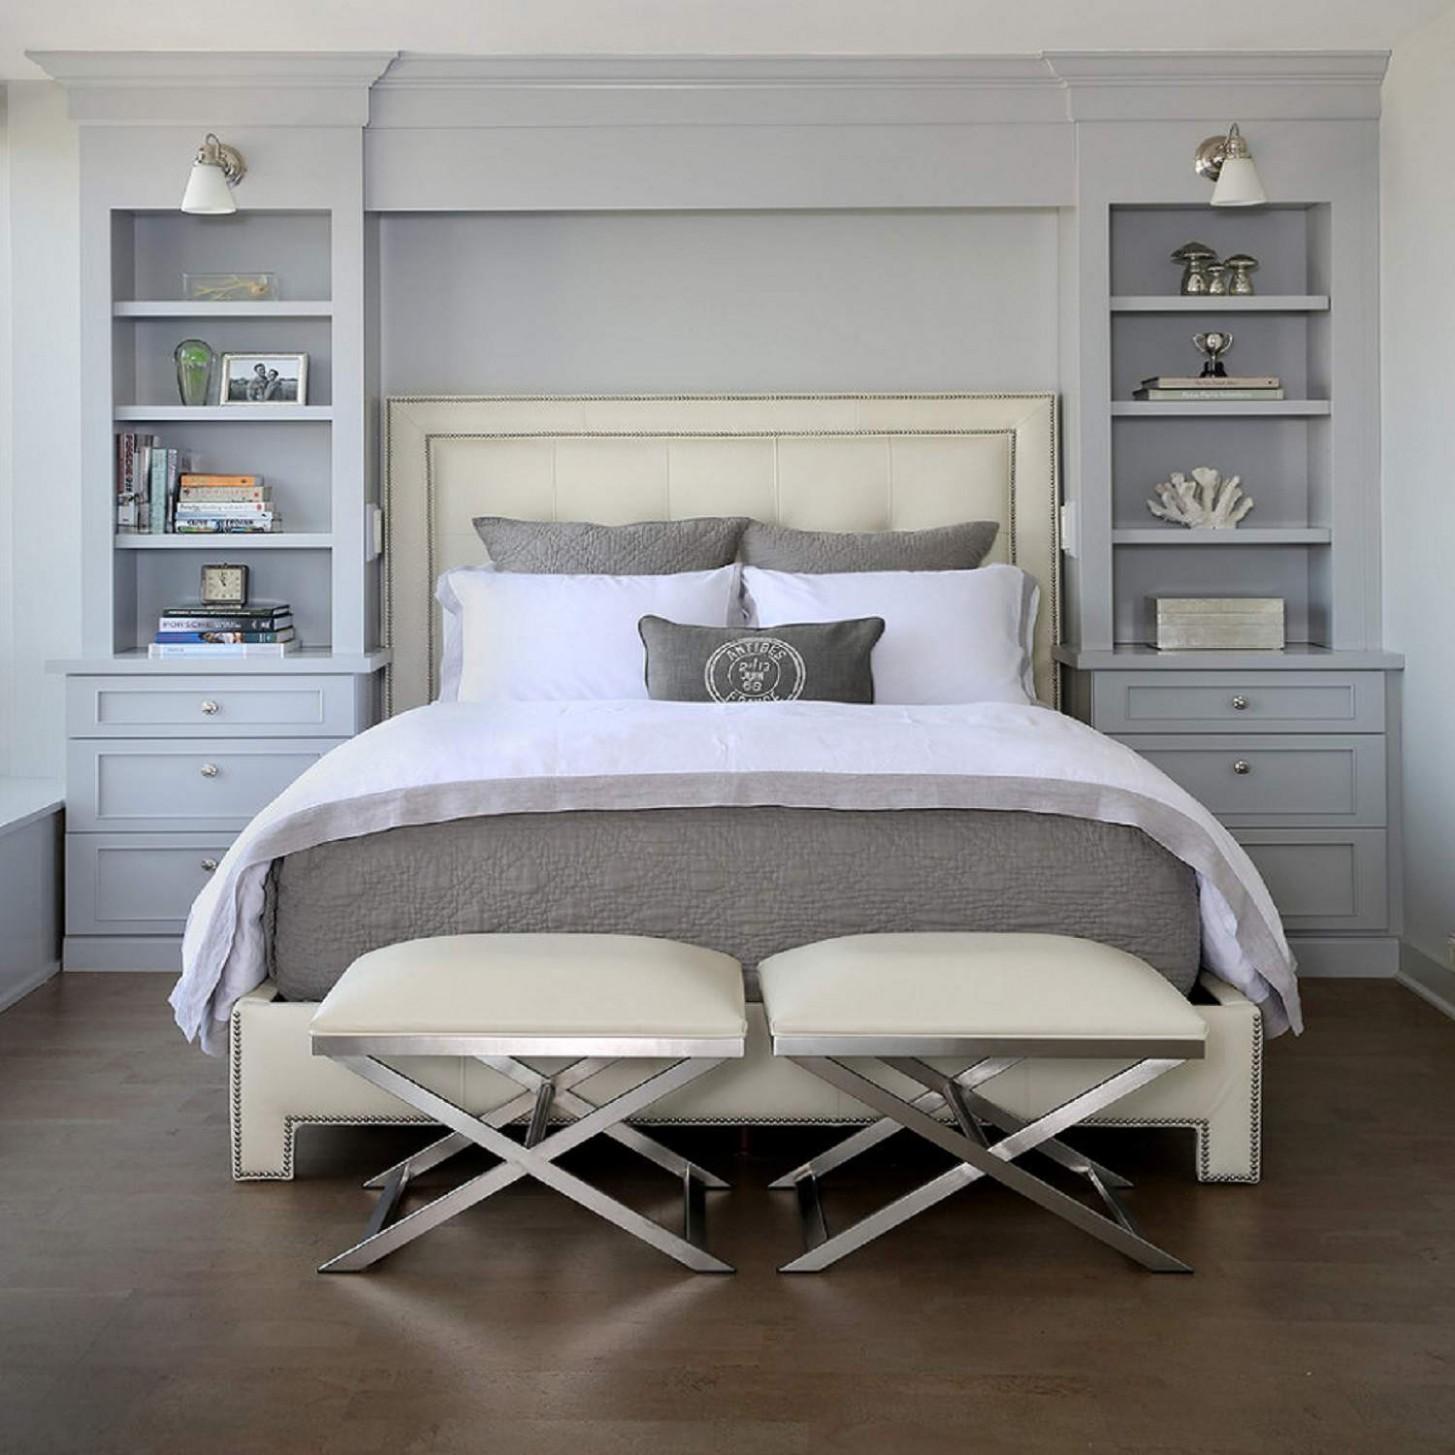 Small Master Bedroom Design Ideas Tips and Photos - Bedroom Ideas Master